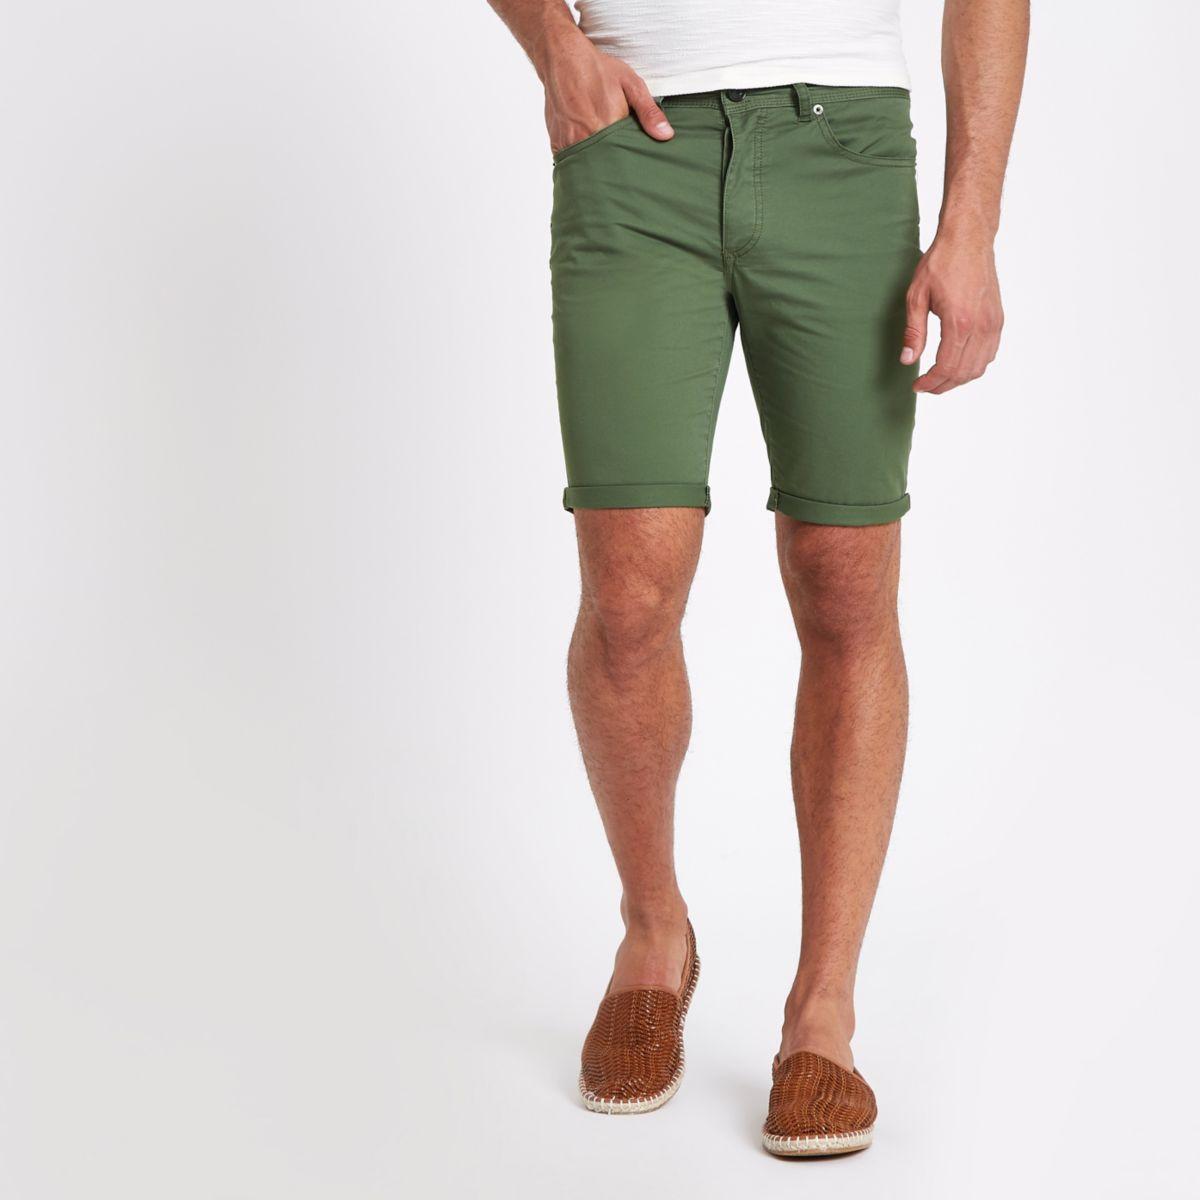 Khaki green skinny fit shorts